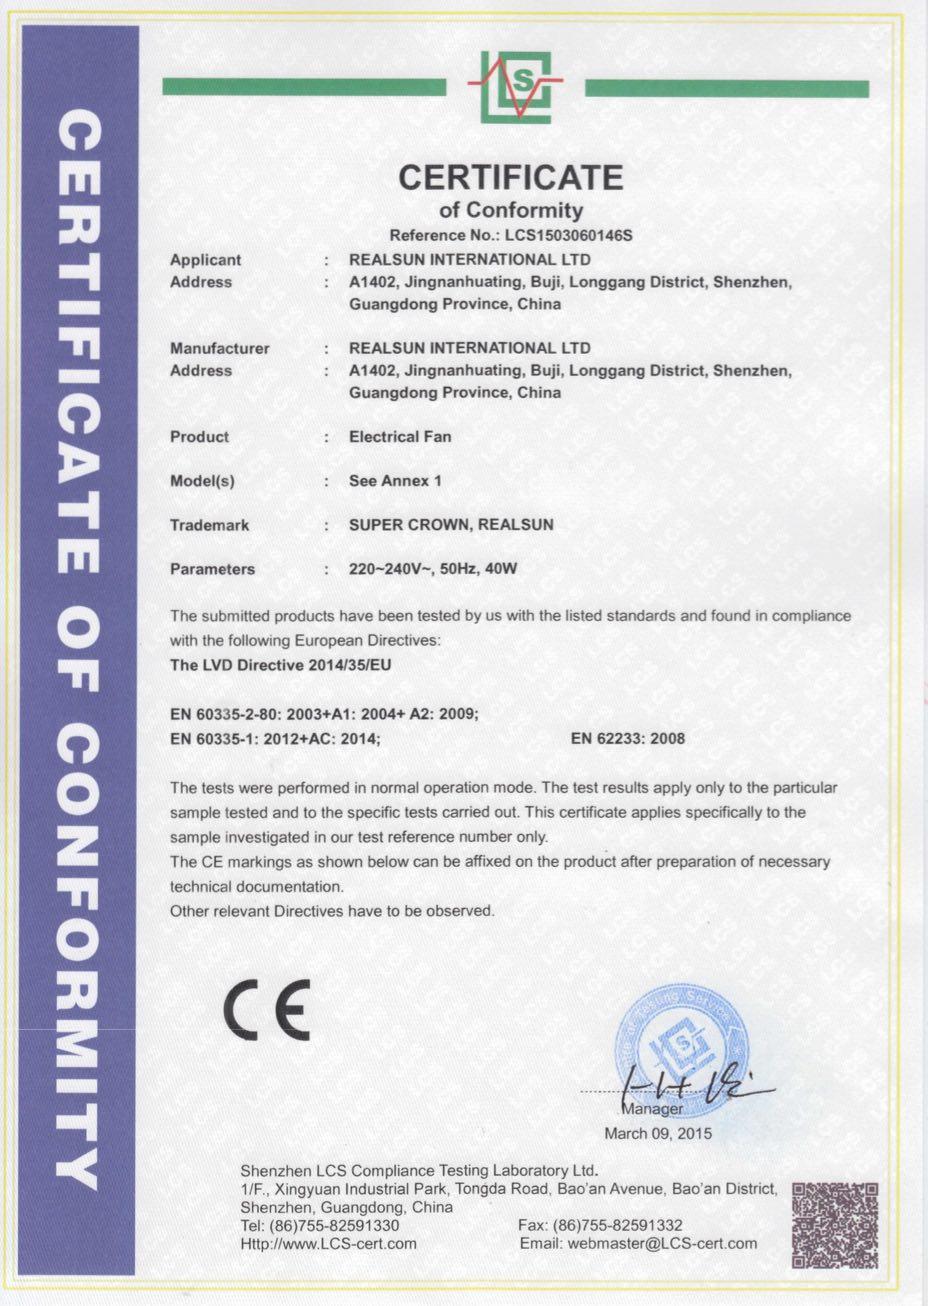 CE certificate for Electrical fan